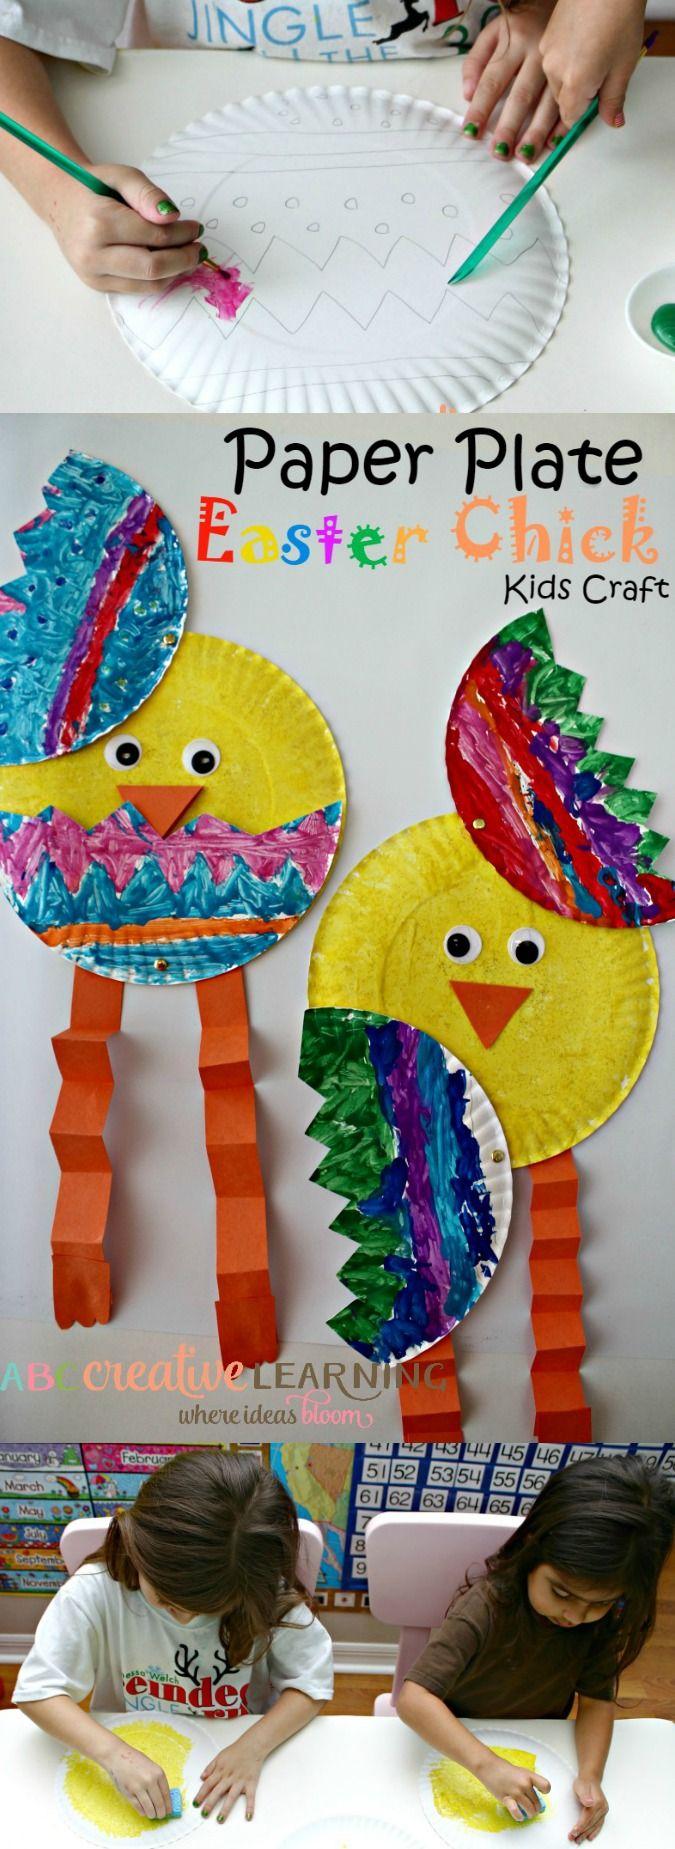 Paper Plate Easter Craft - simplytodaylife.com